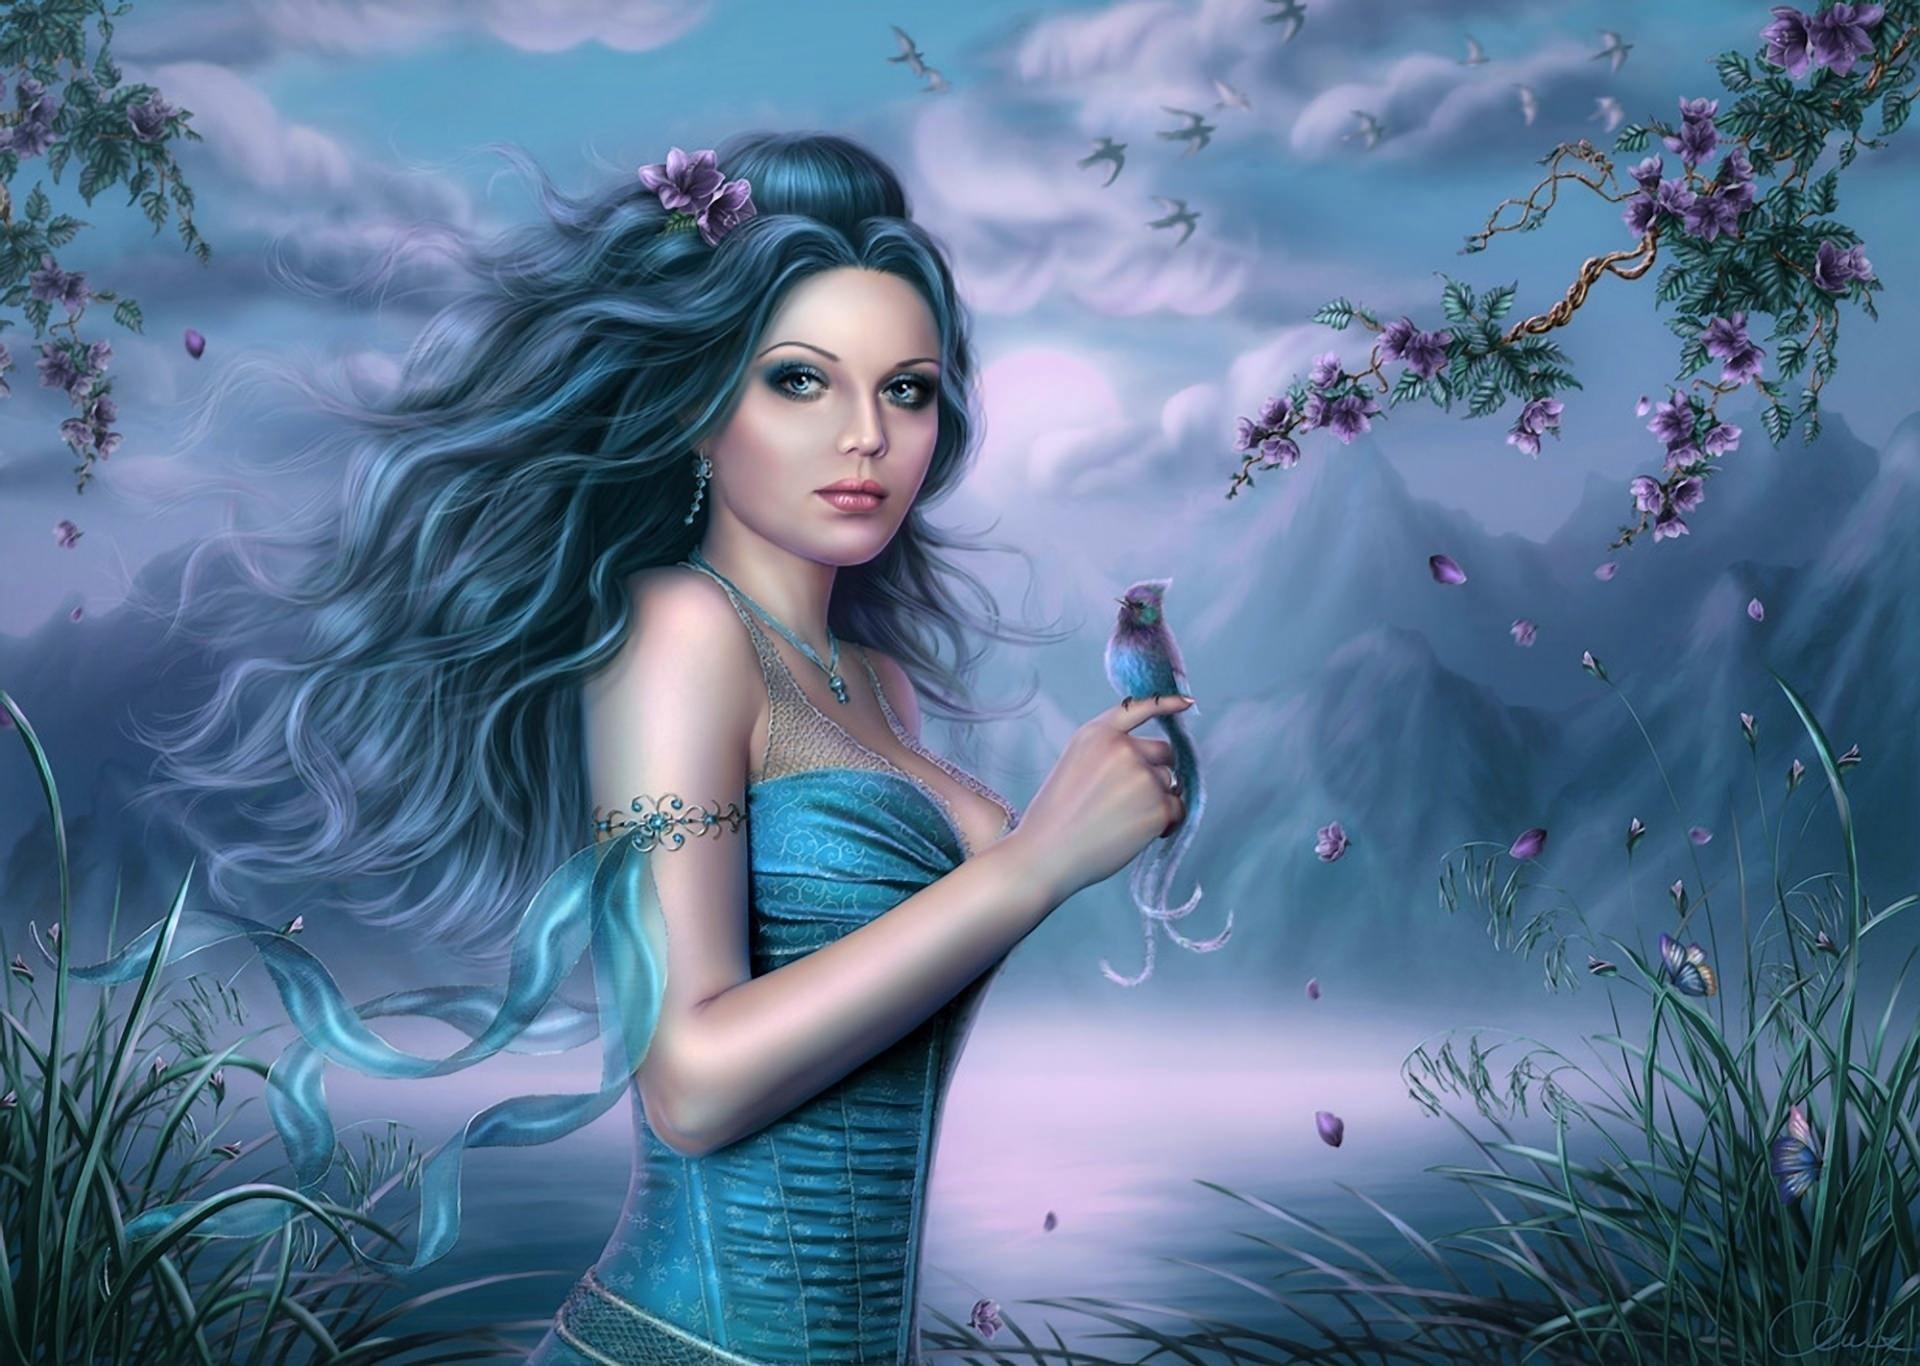 Res: 1920x1366, 3D Cute Girl Wallpaper free download